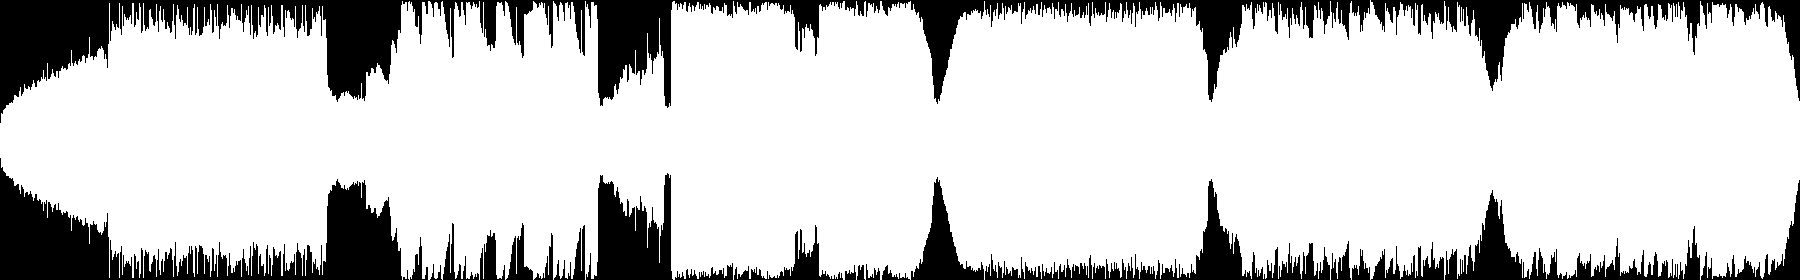 Skygarden - Lofi Hip Hop audio waveform